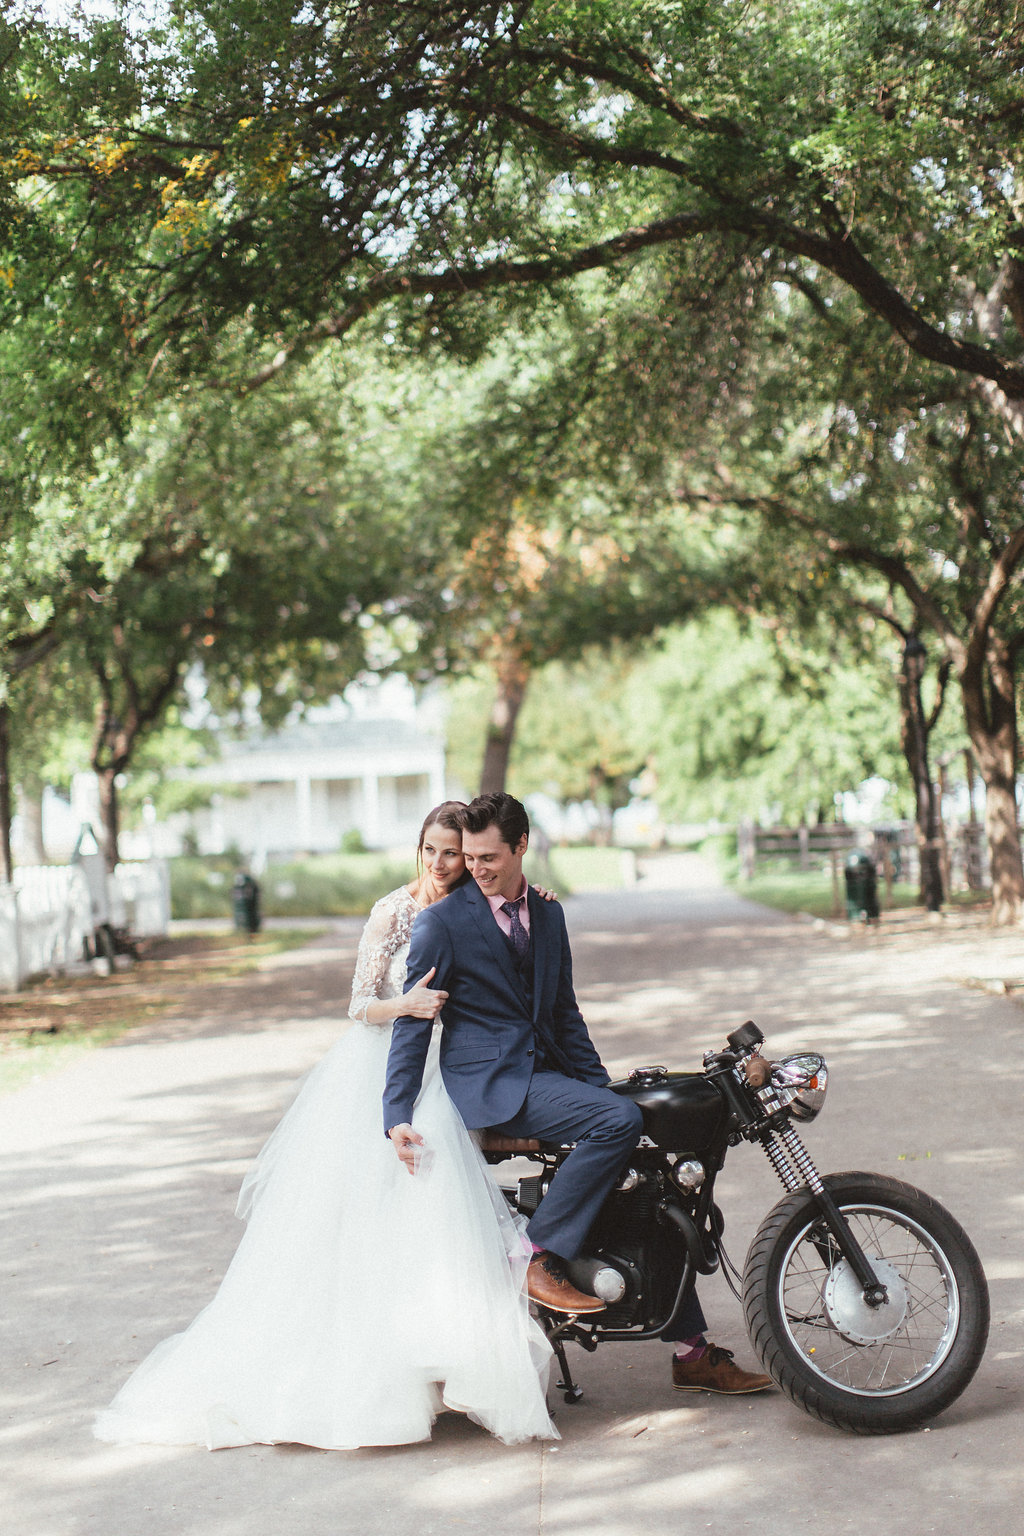 Bride and Groom on a motorcycle // Dallas Wedding Floral Design